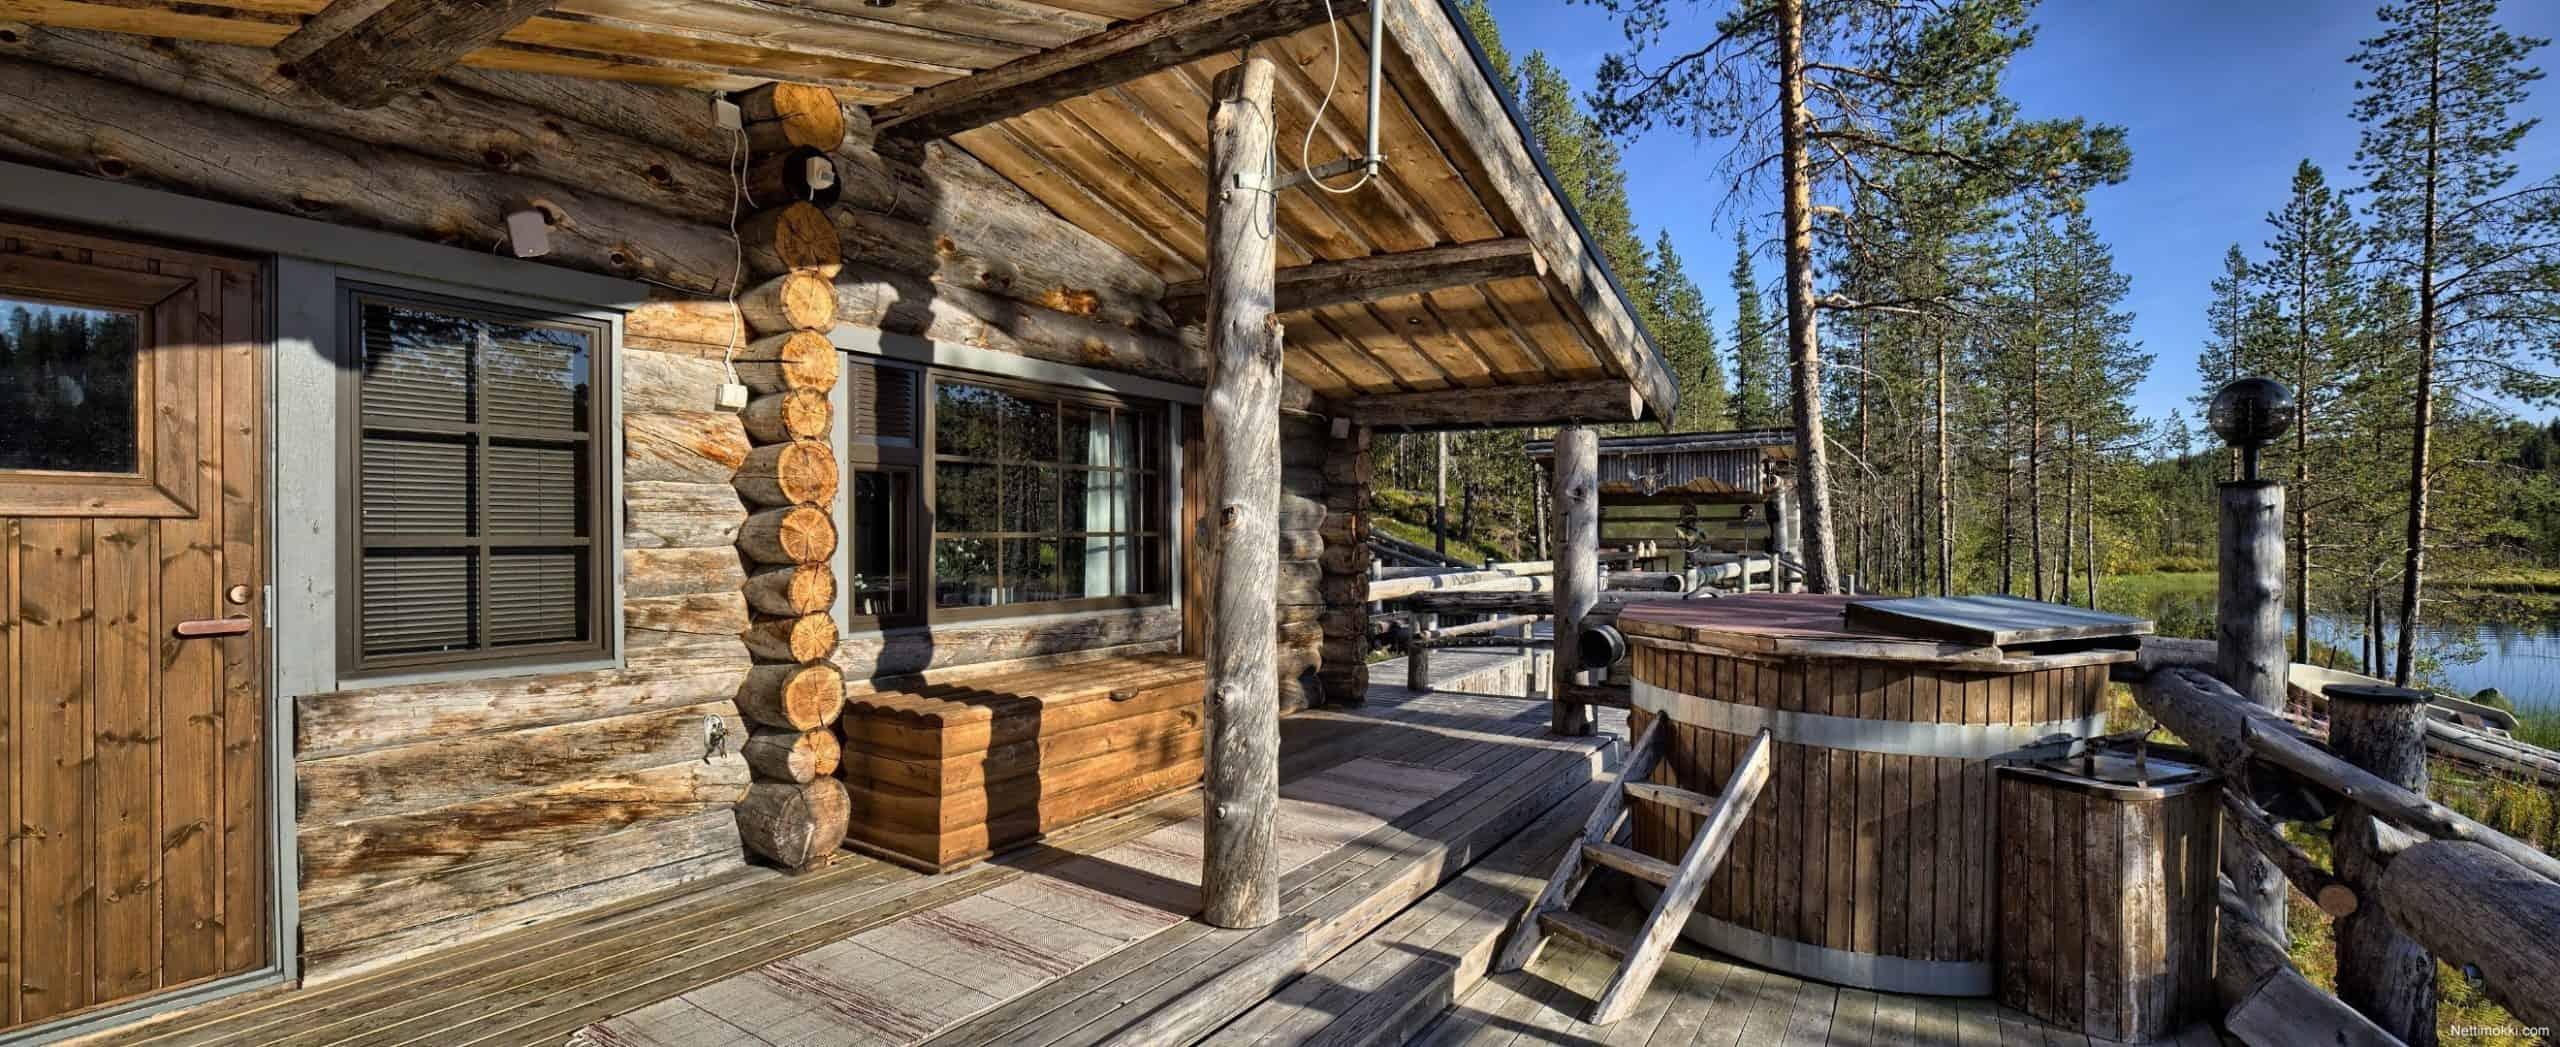 Lappland Snowkite-Camp 22.01.-05.02. 2022 8